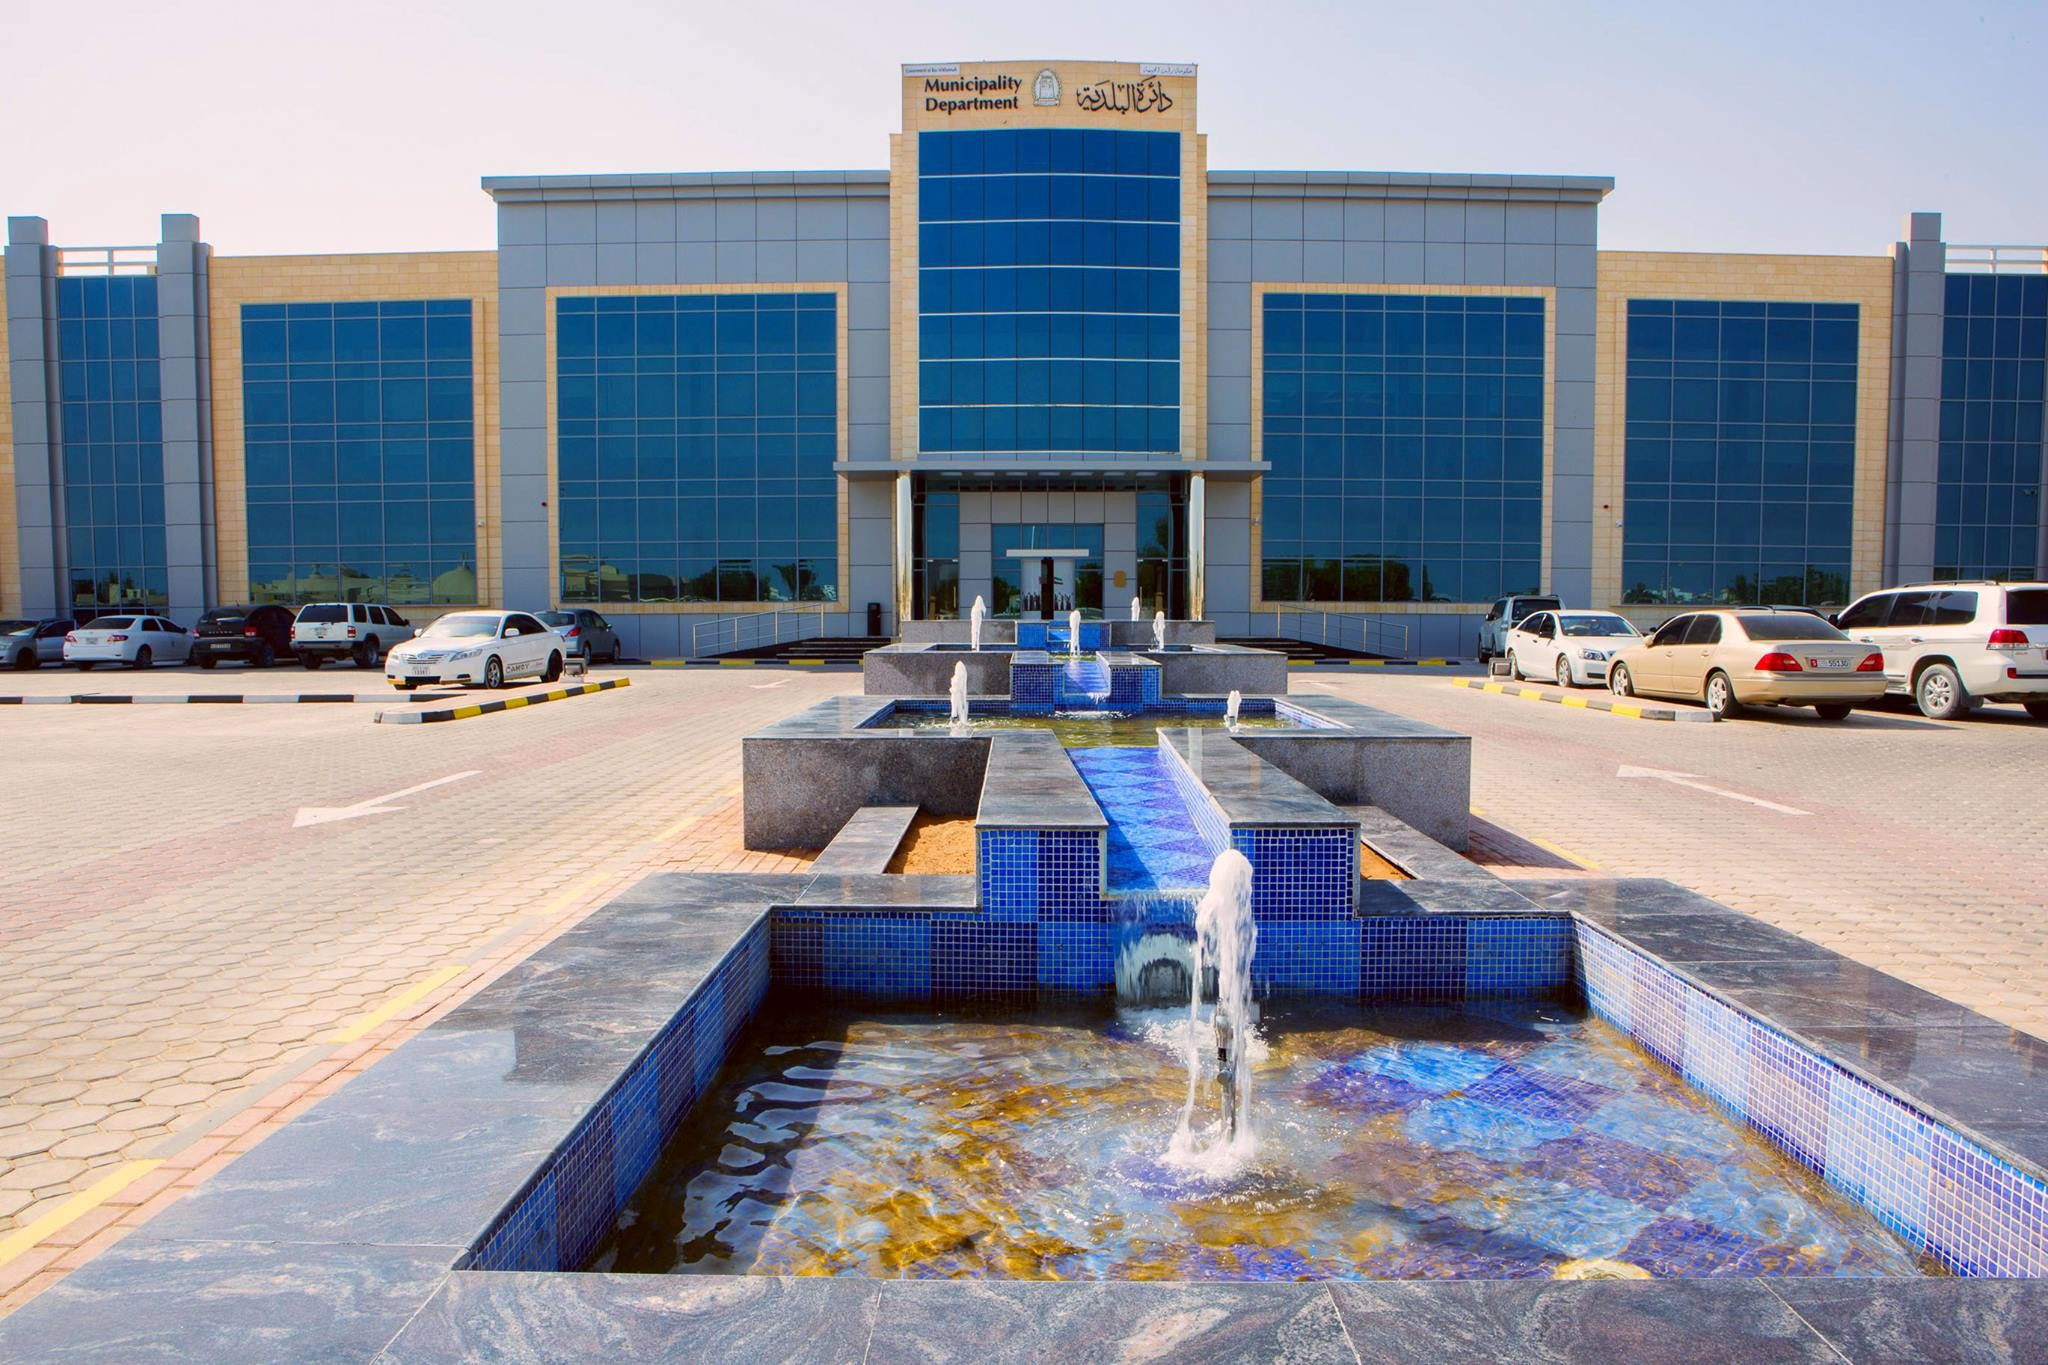 Ras Al Khaimah Municipality Department Linkedin